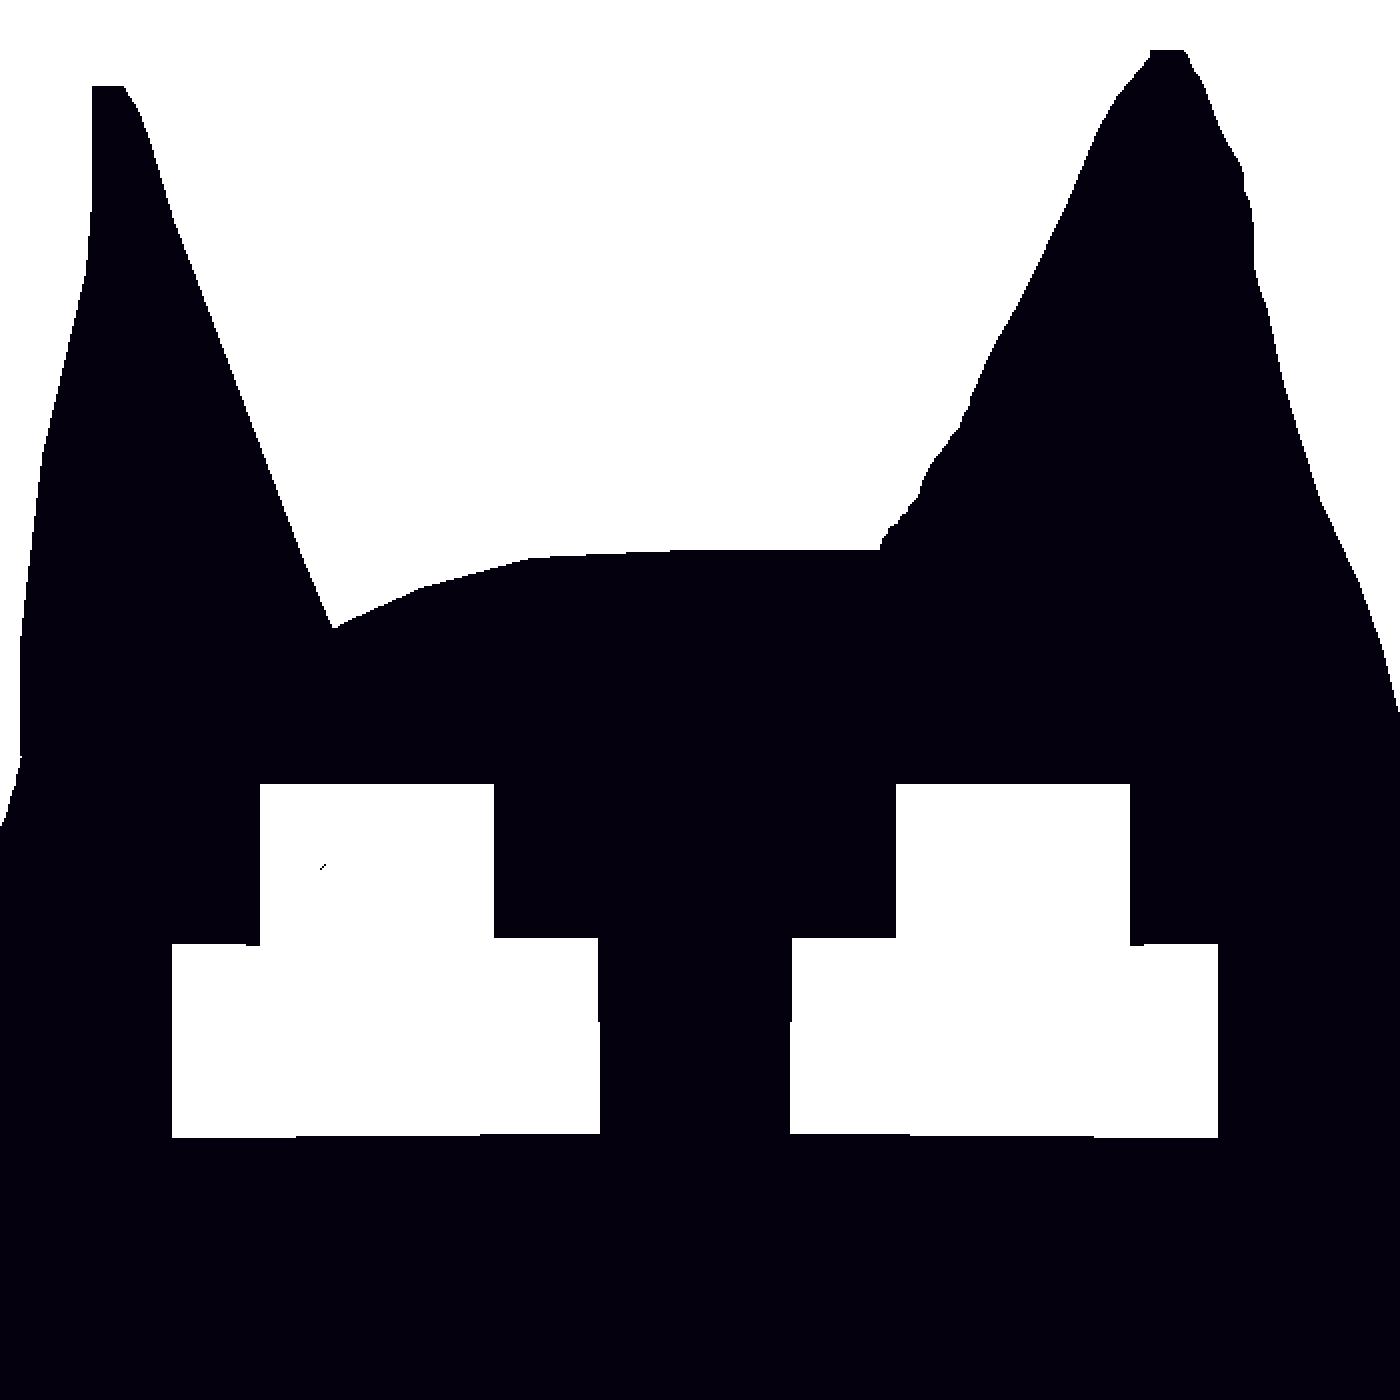 main-image-evil cat  by Devaedra